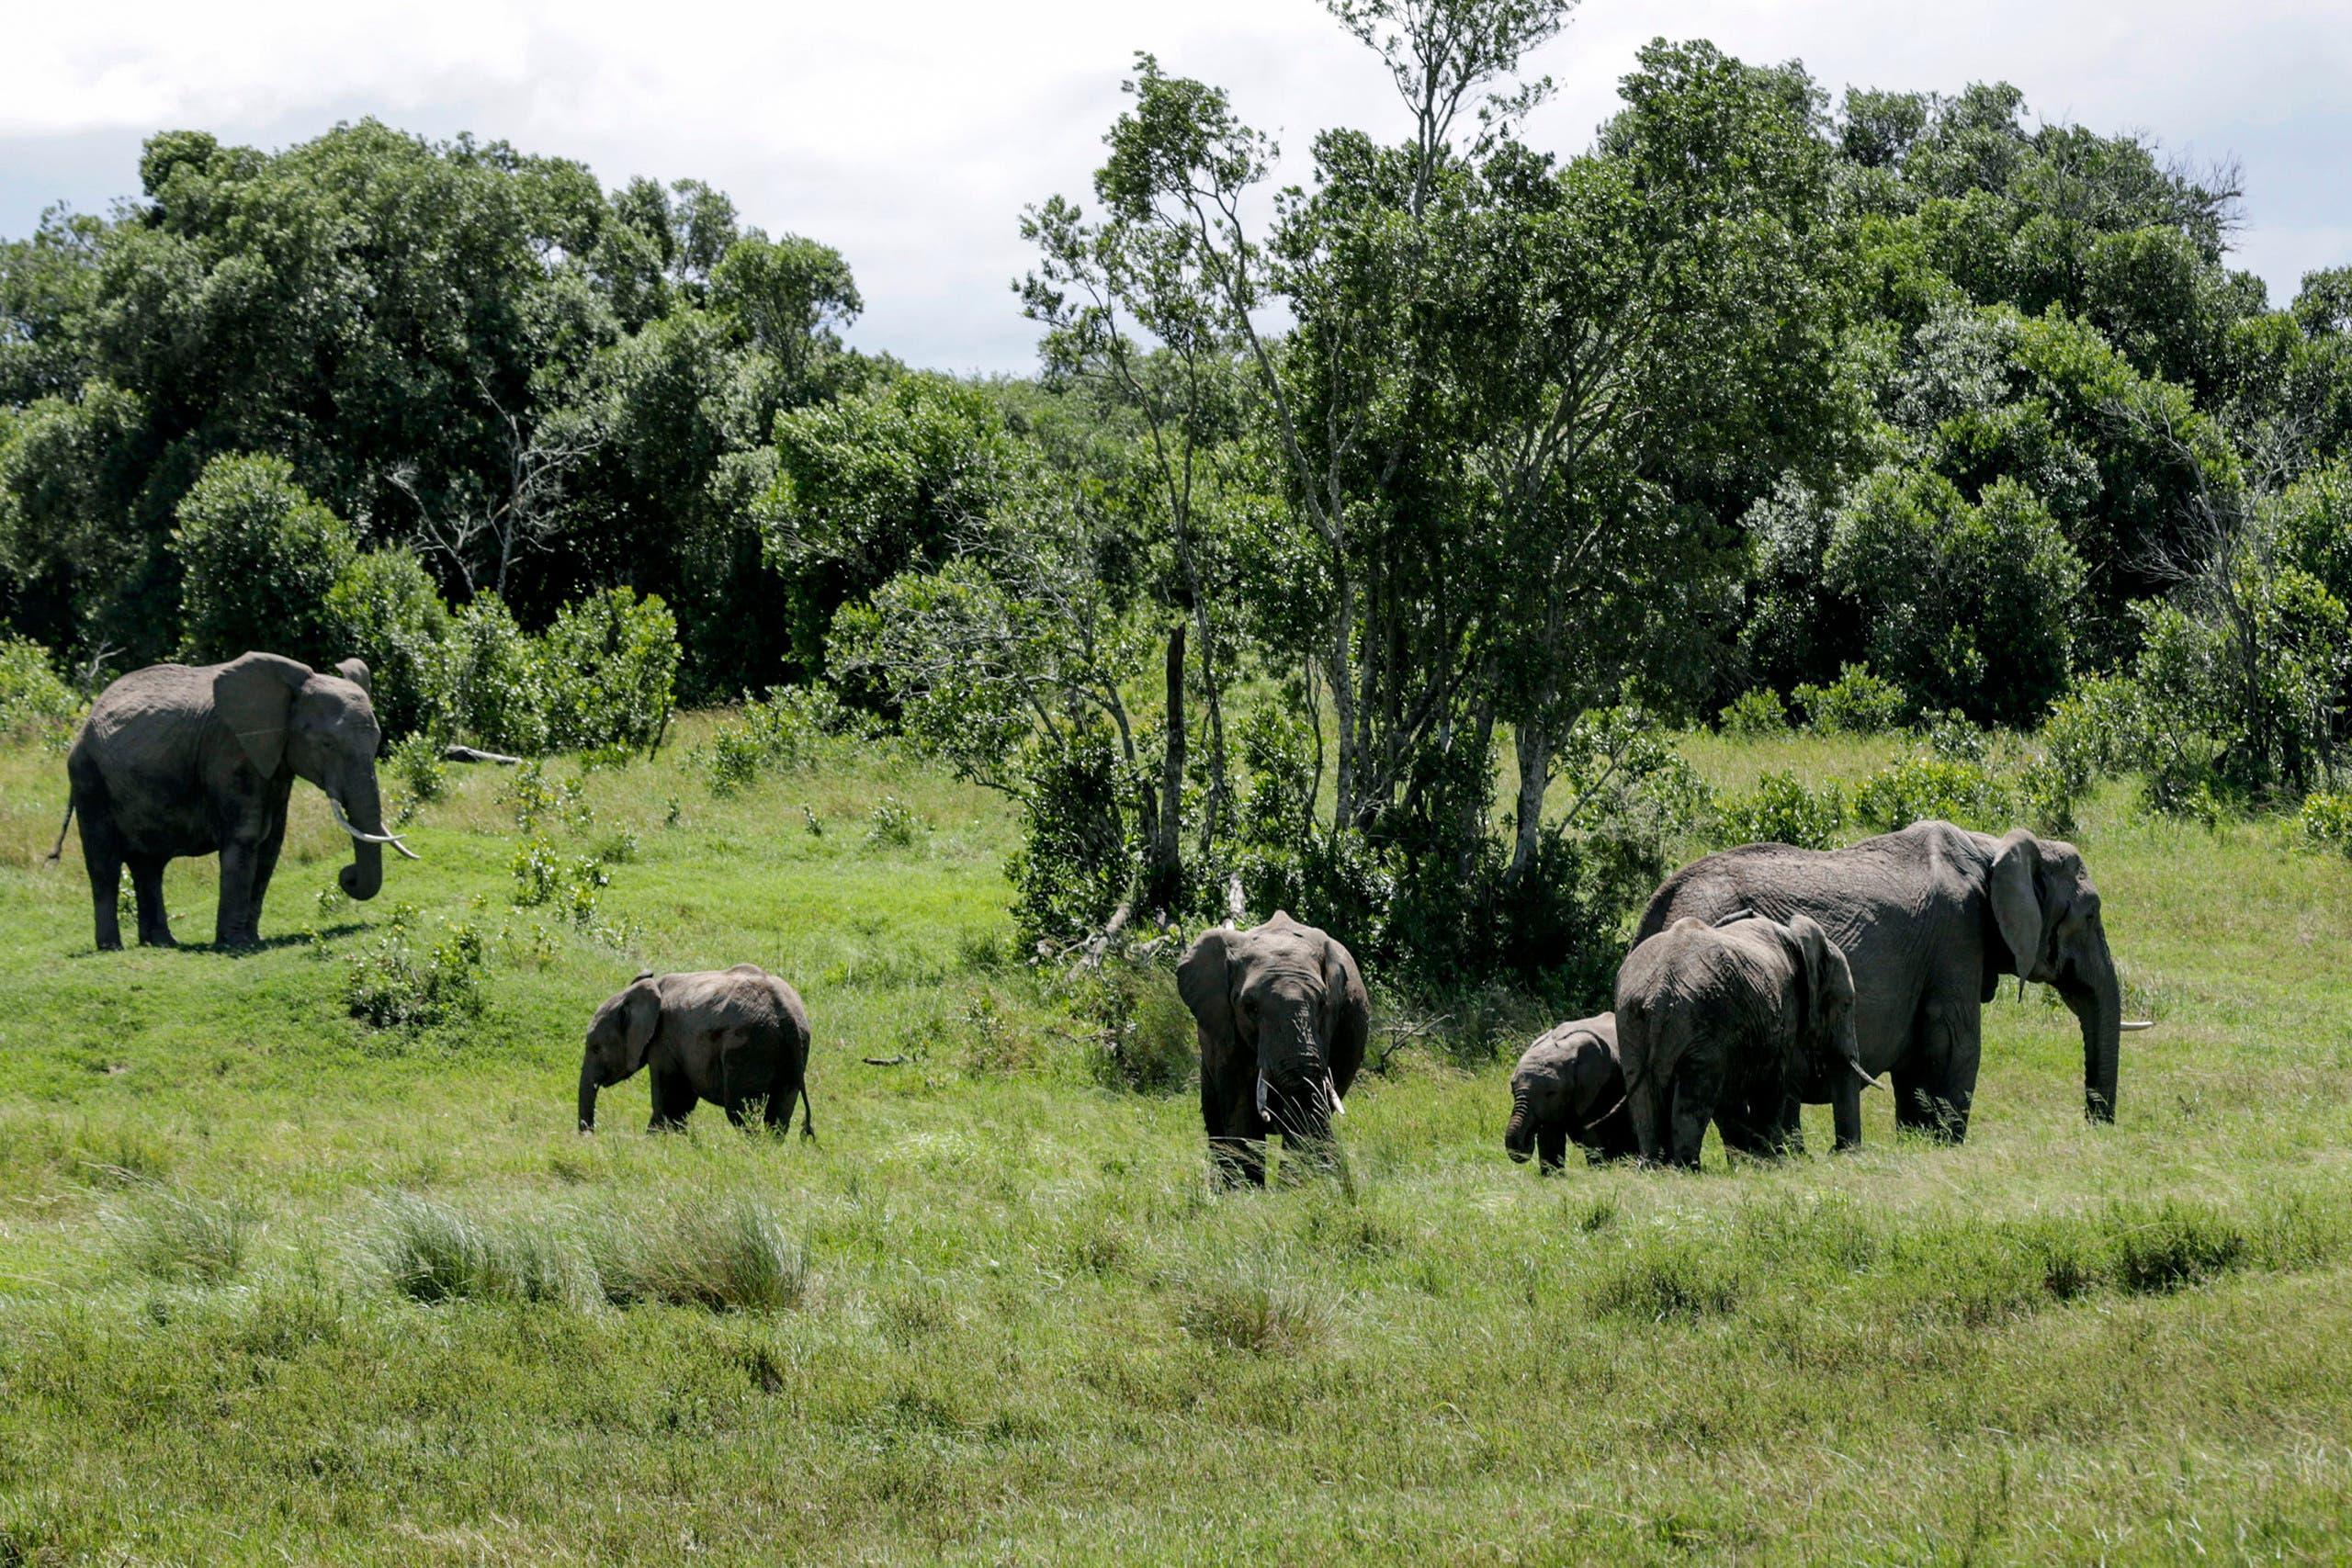 In this photo taken Saturday, May 2, 2020, a family of elephants graze in Ol Pejeta conservancy, Kenya. AP